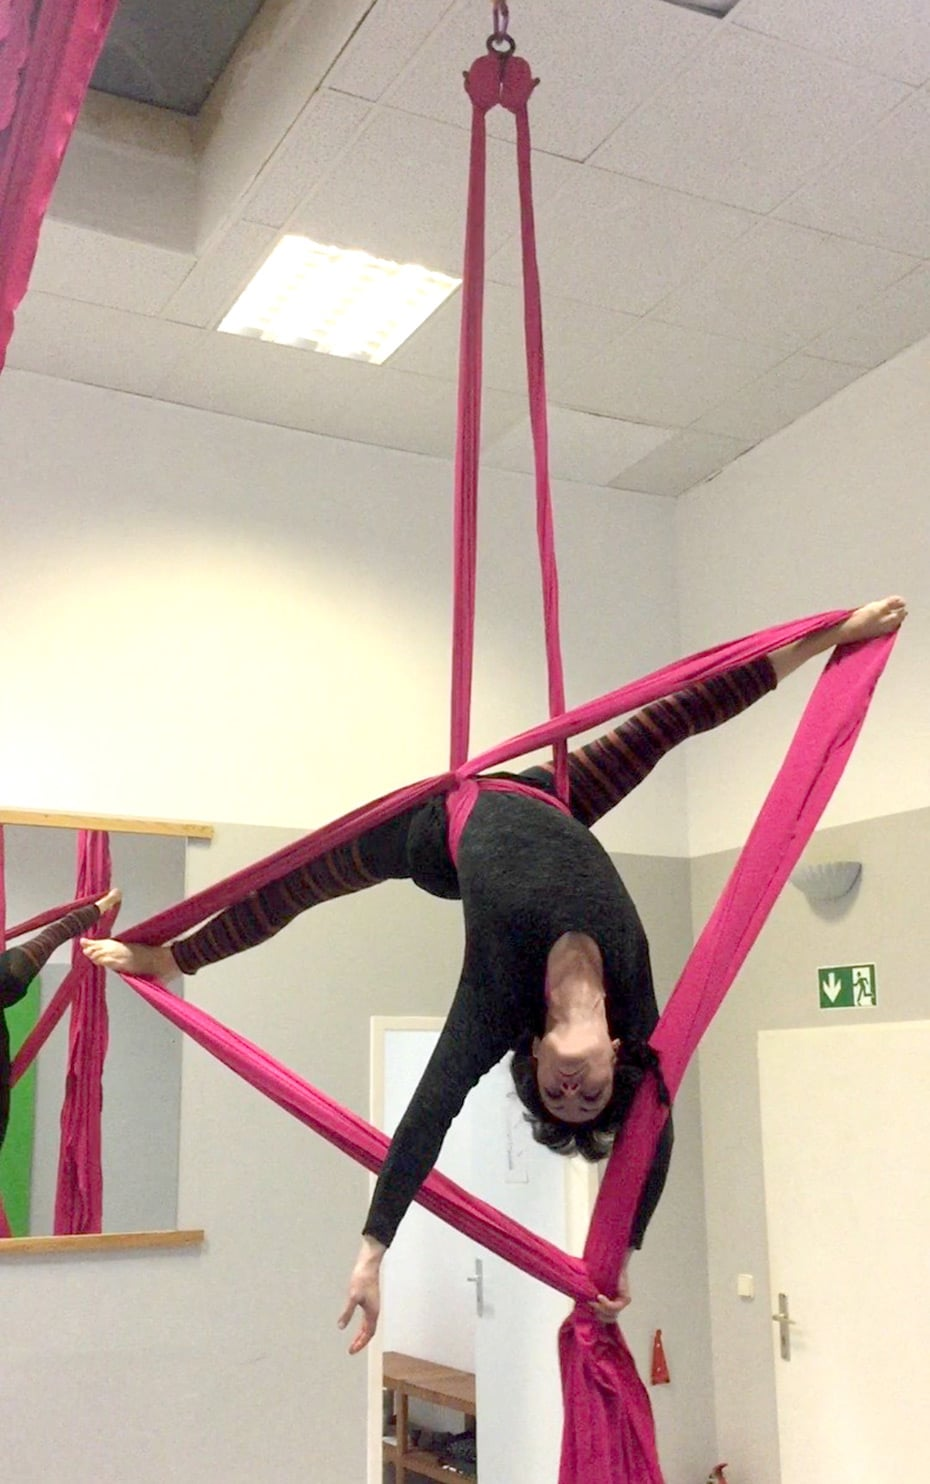 Jasmin liebt Aerial Silks | Schwatz Katz